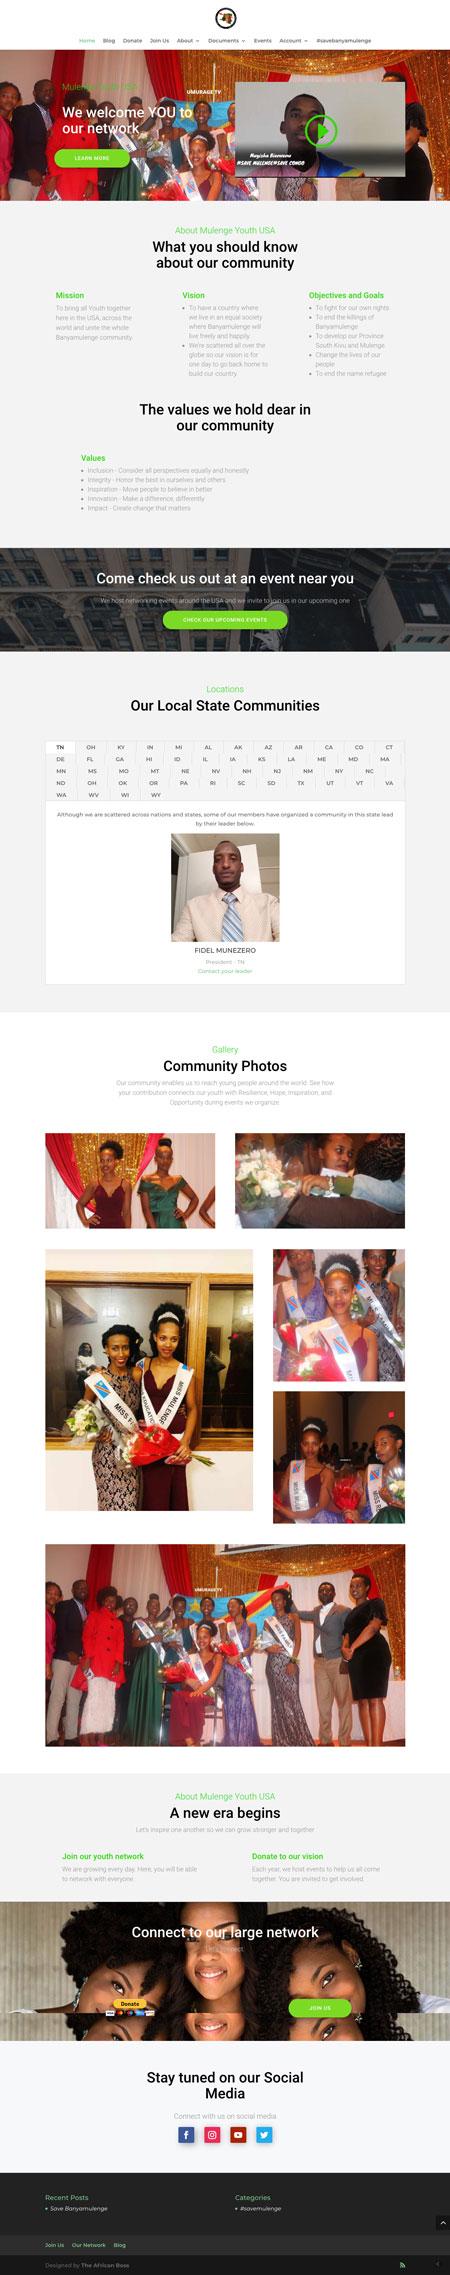 Mulenge Youth website screenshot